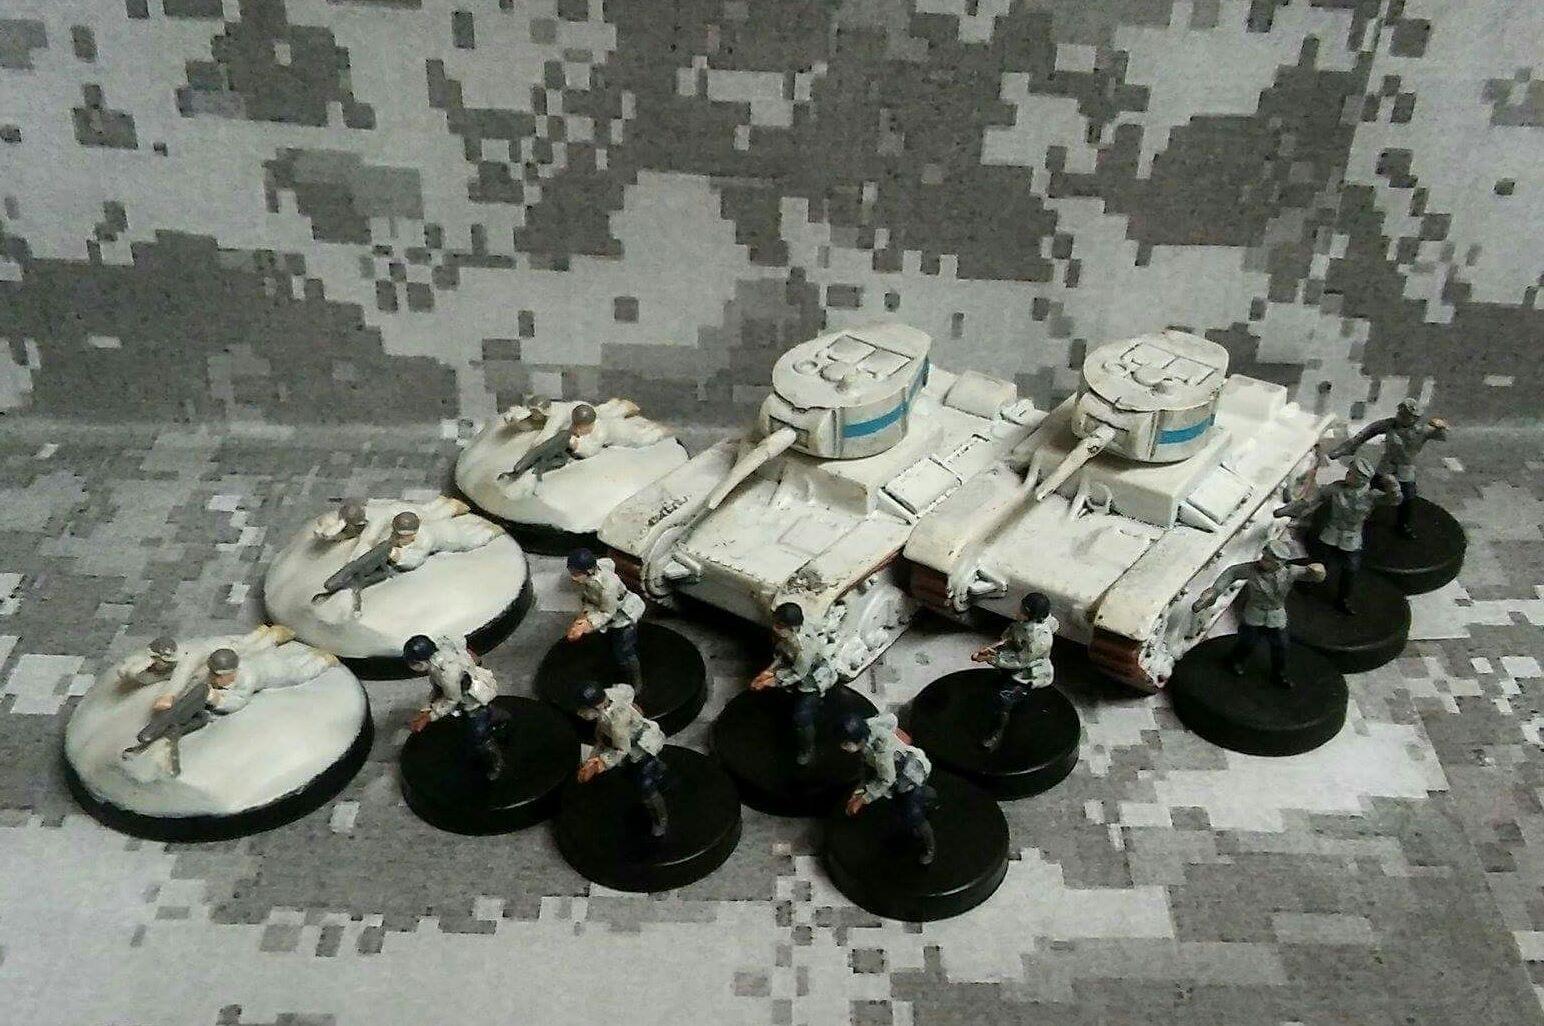 Toys of Warfare